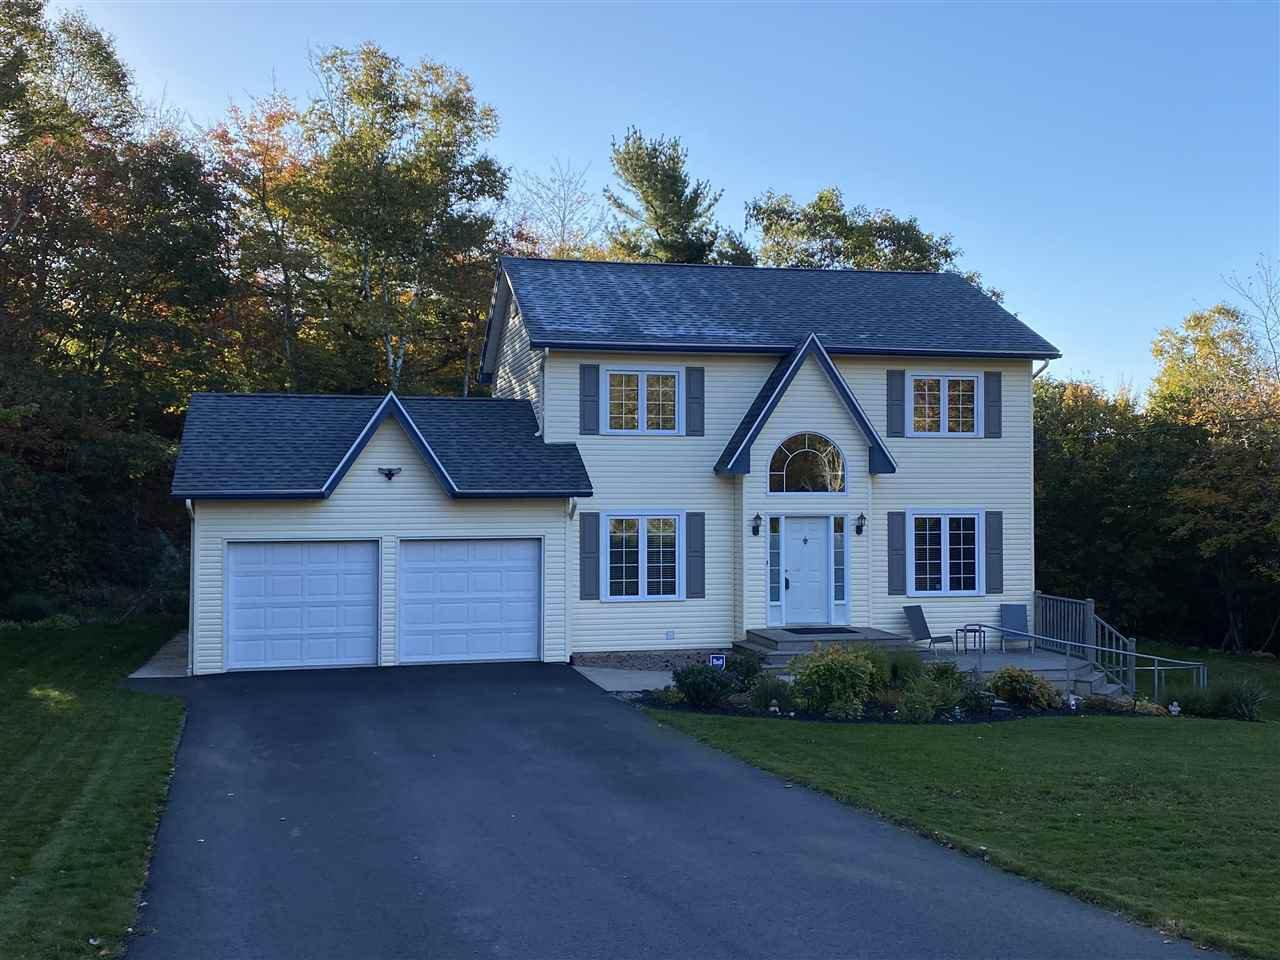 Main Photo: 207 Haliburton Crescent in Stillwater Lake: 21-Kingswood, Haliburton Hills, Hammonds Pl. Residential for sale (Halifax-Dartmouth)  : MLS®# 202018455